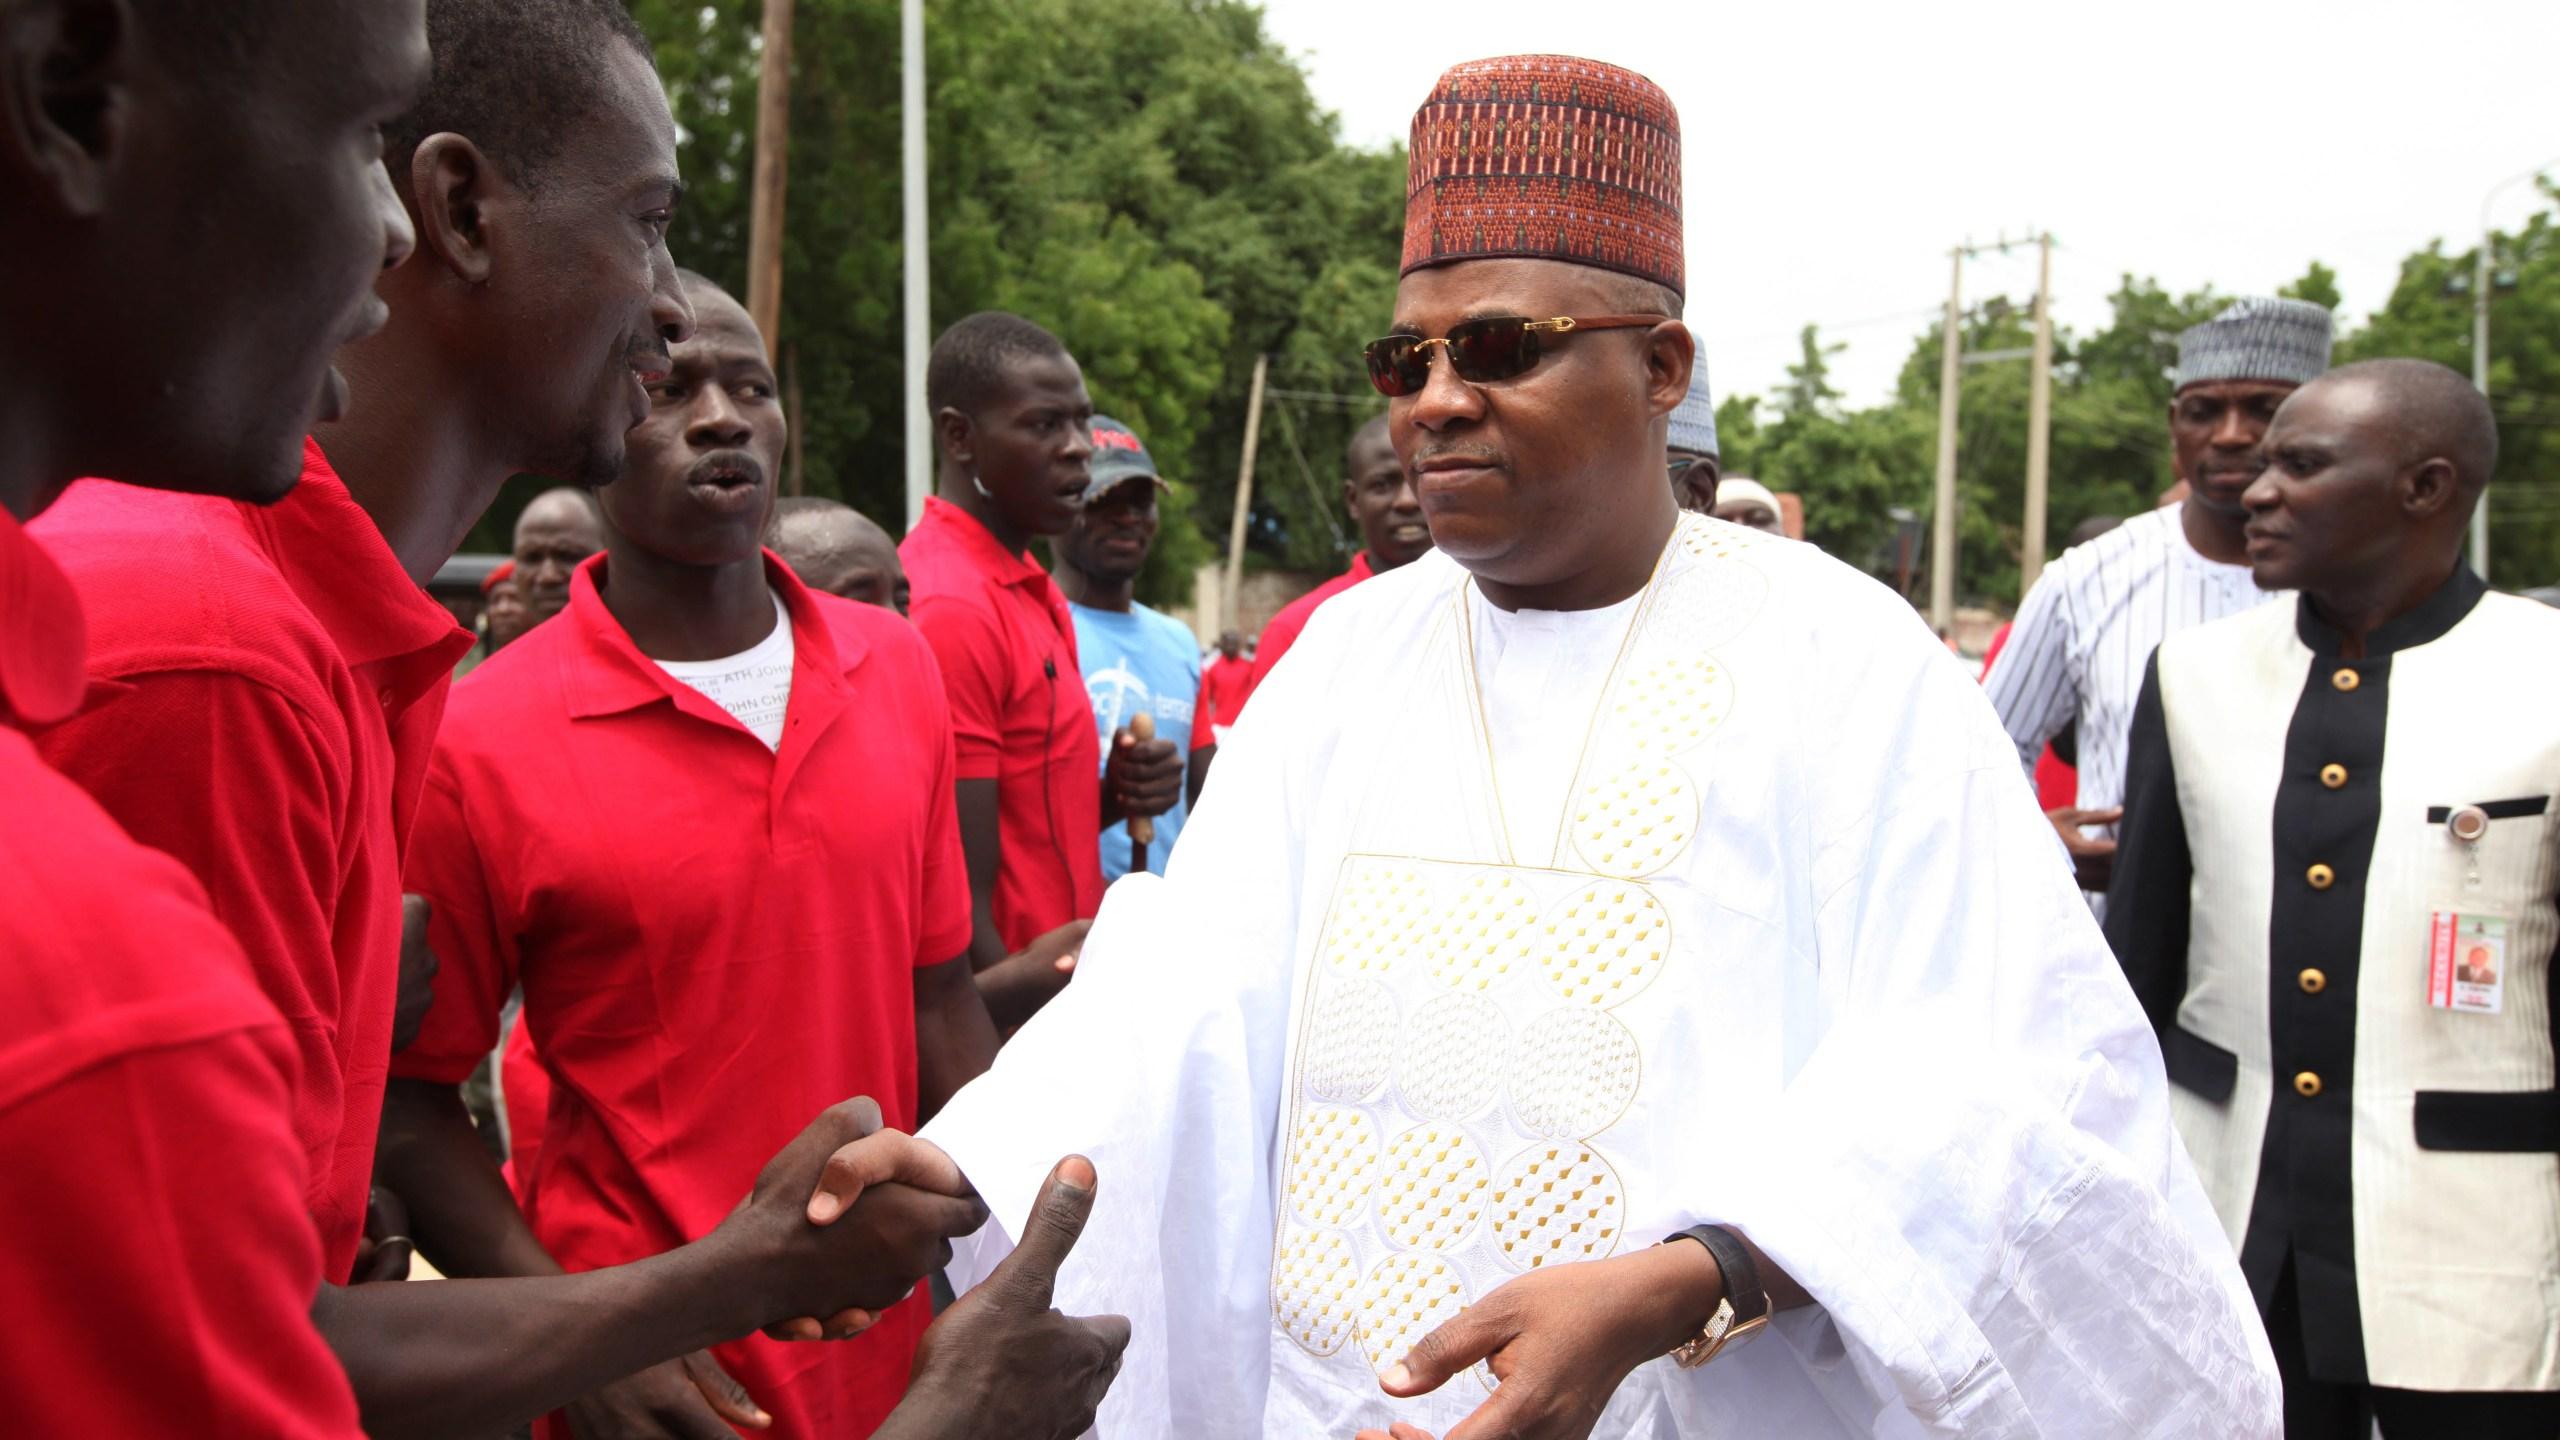 FILE PHOTO Borno, Nigeria Governor Kashim Shettima Photo by Sunday Alamba, AP Photo_235862